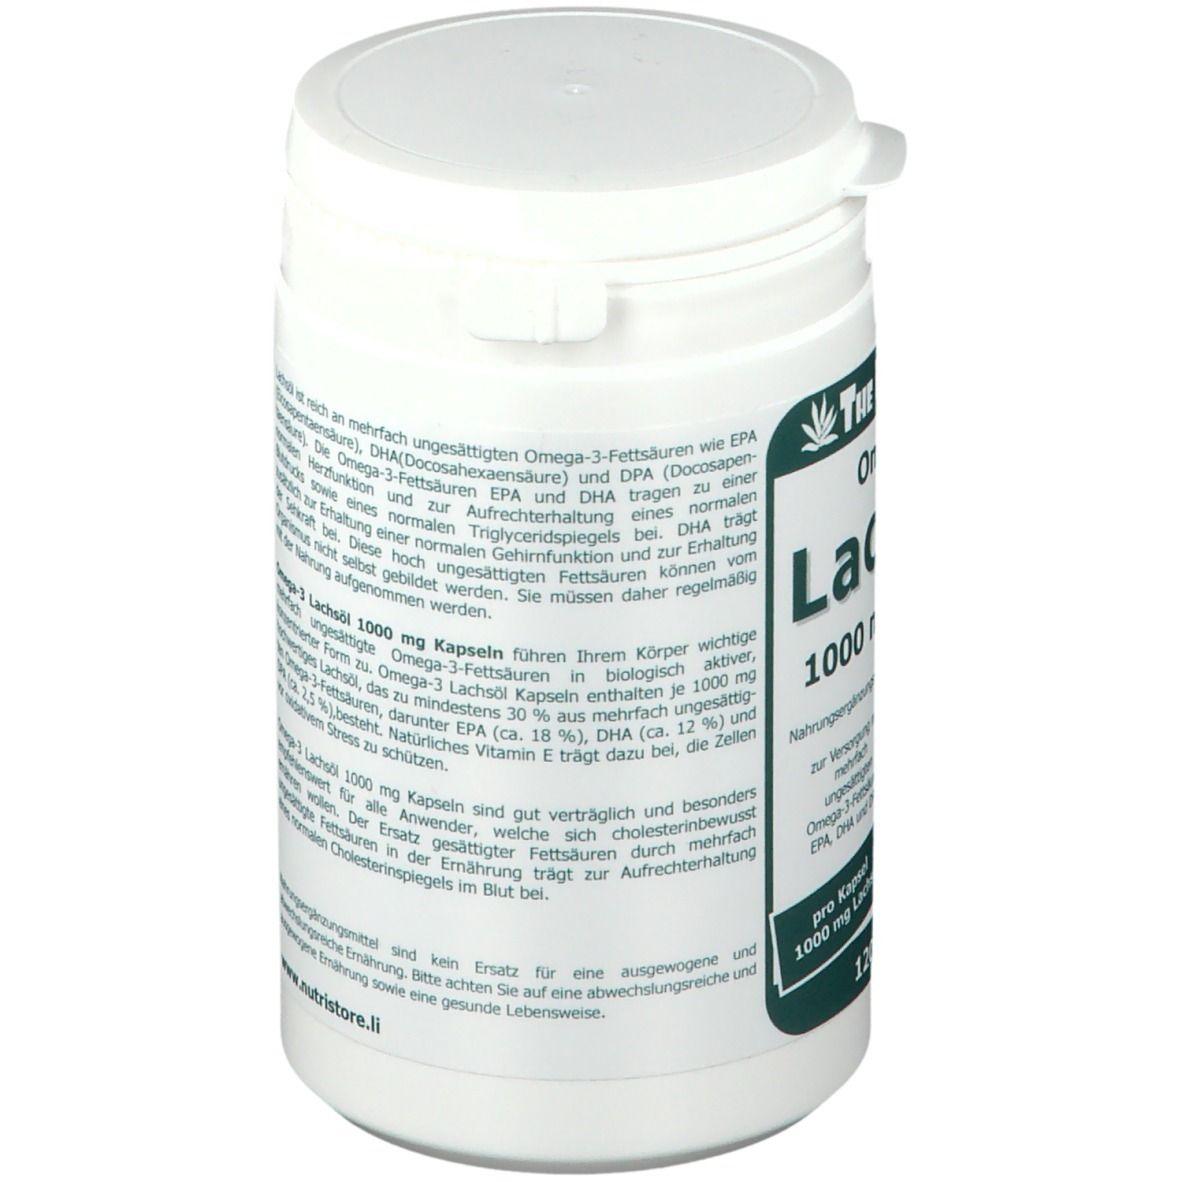 Omega-3 Lachsöl 1000 mg Kapseln